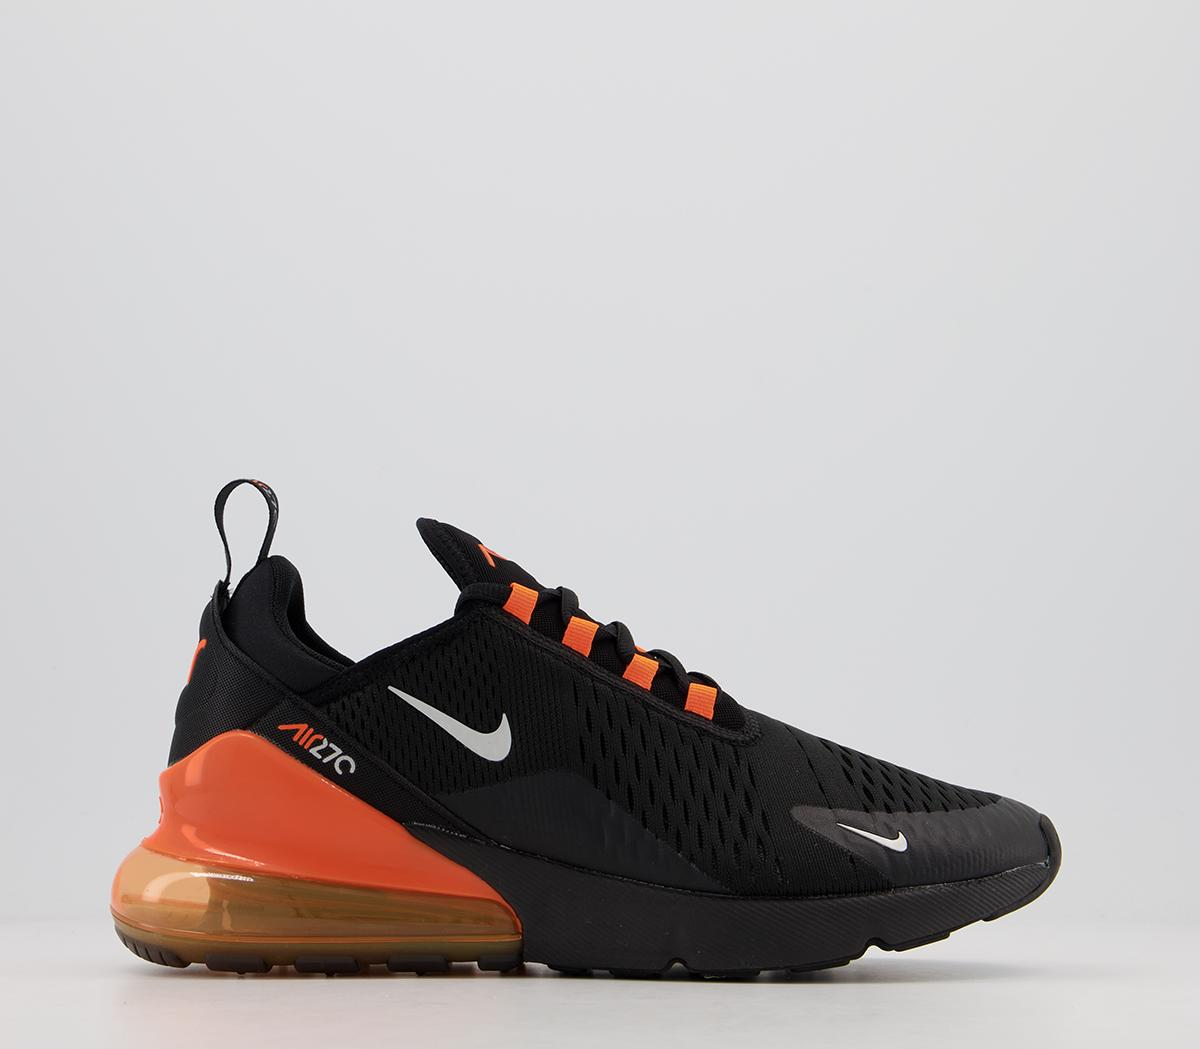 Nike Air Max 270 Trainers Black